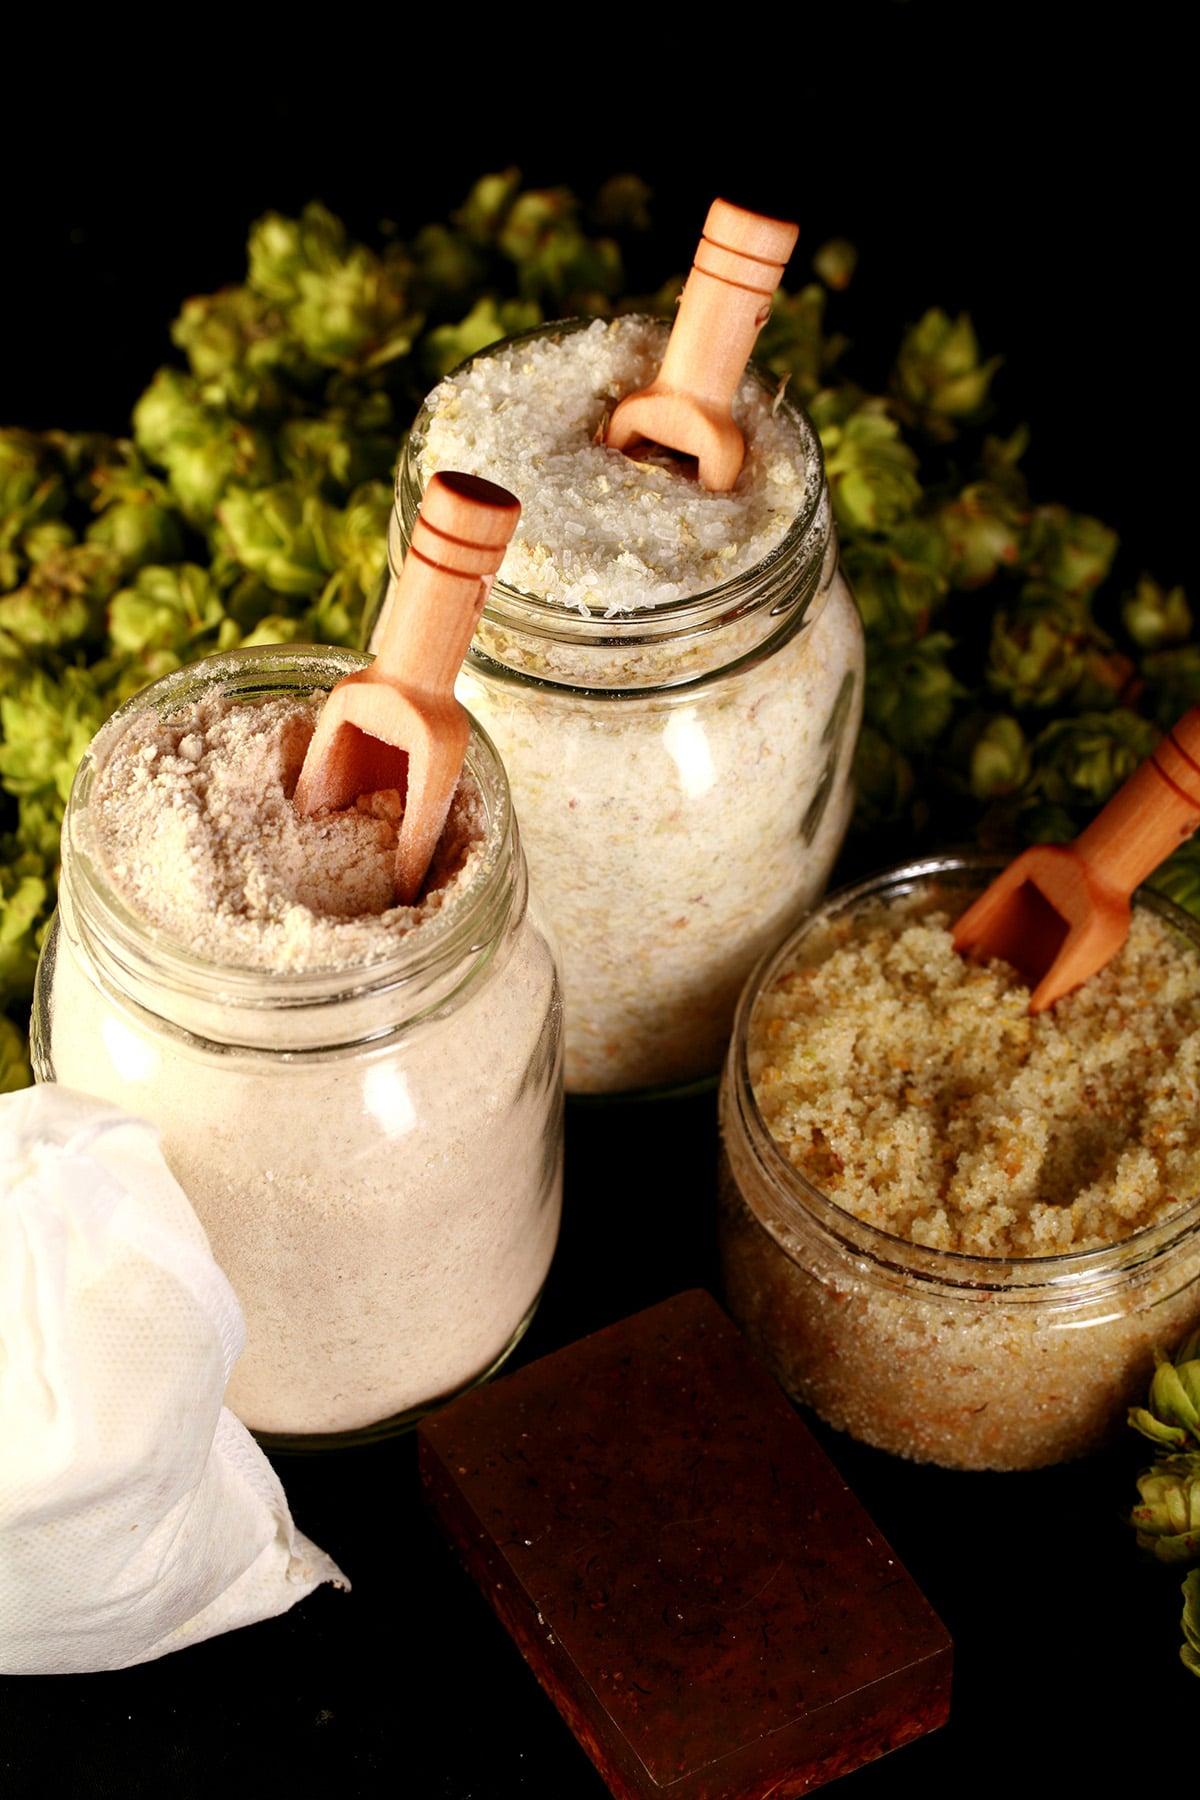 A 4 piece hop spa set, including a bar of hop soap, a canister of hop salt scrub, a jar of hop bath salt, and a jar of hop malted milk bath. A fresh hop bine is in the background.